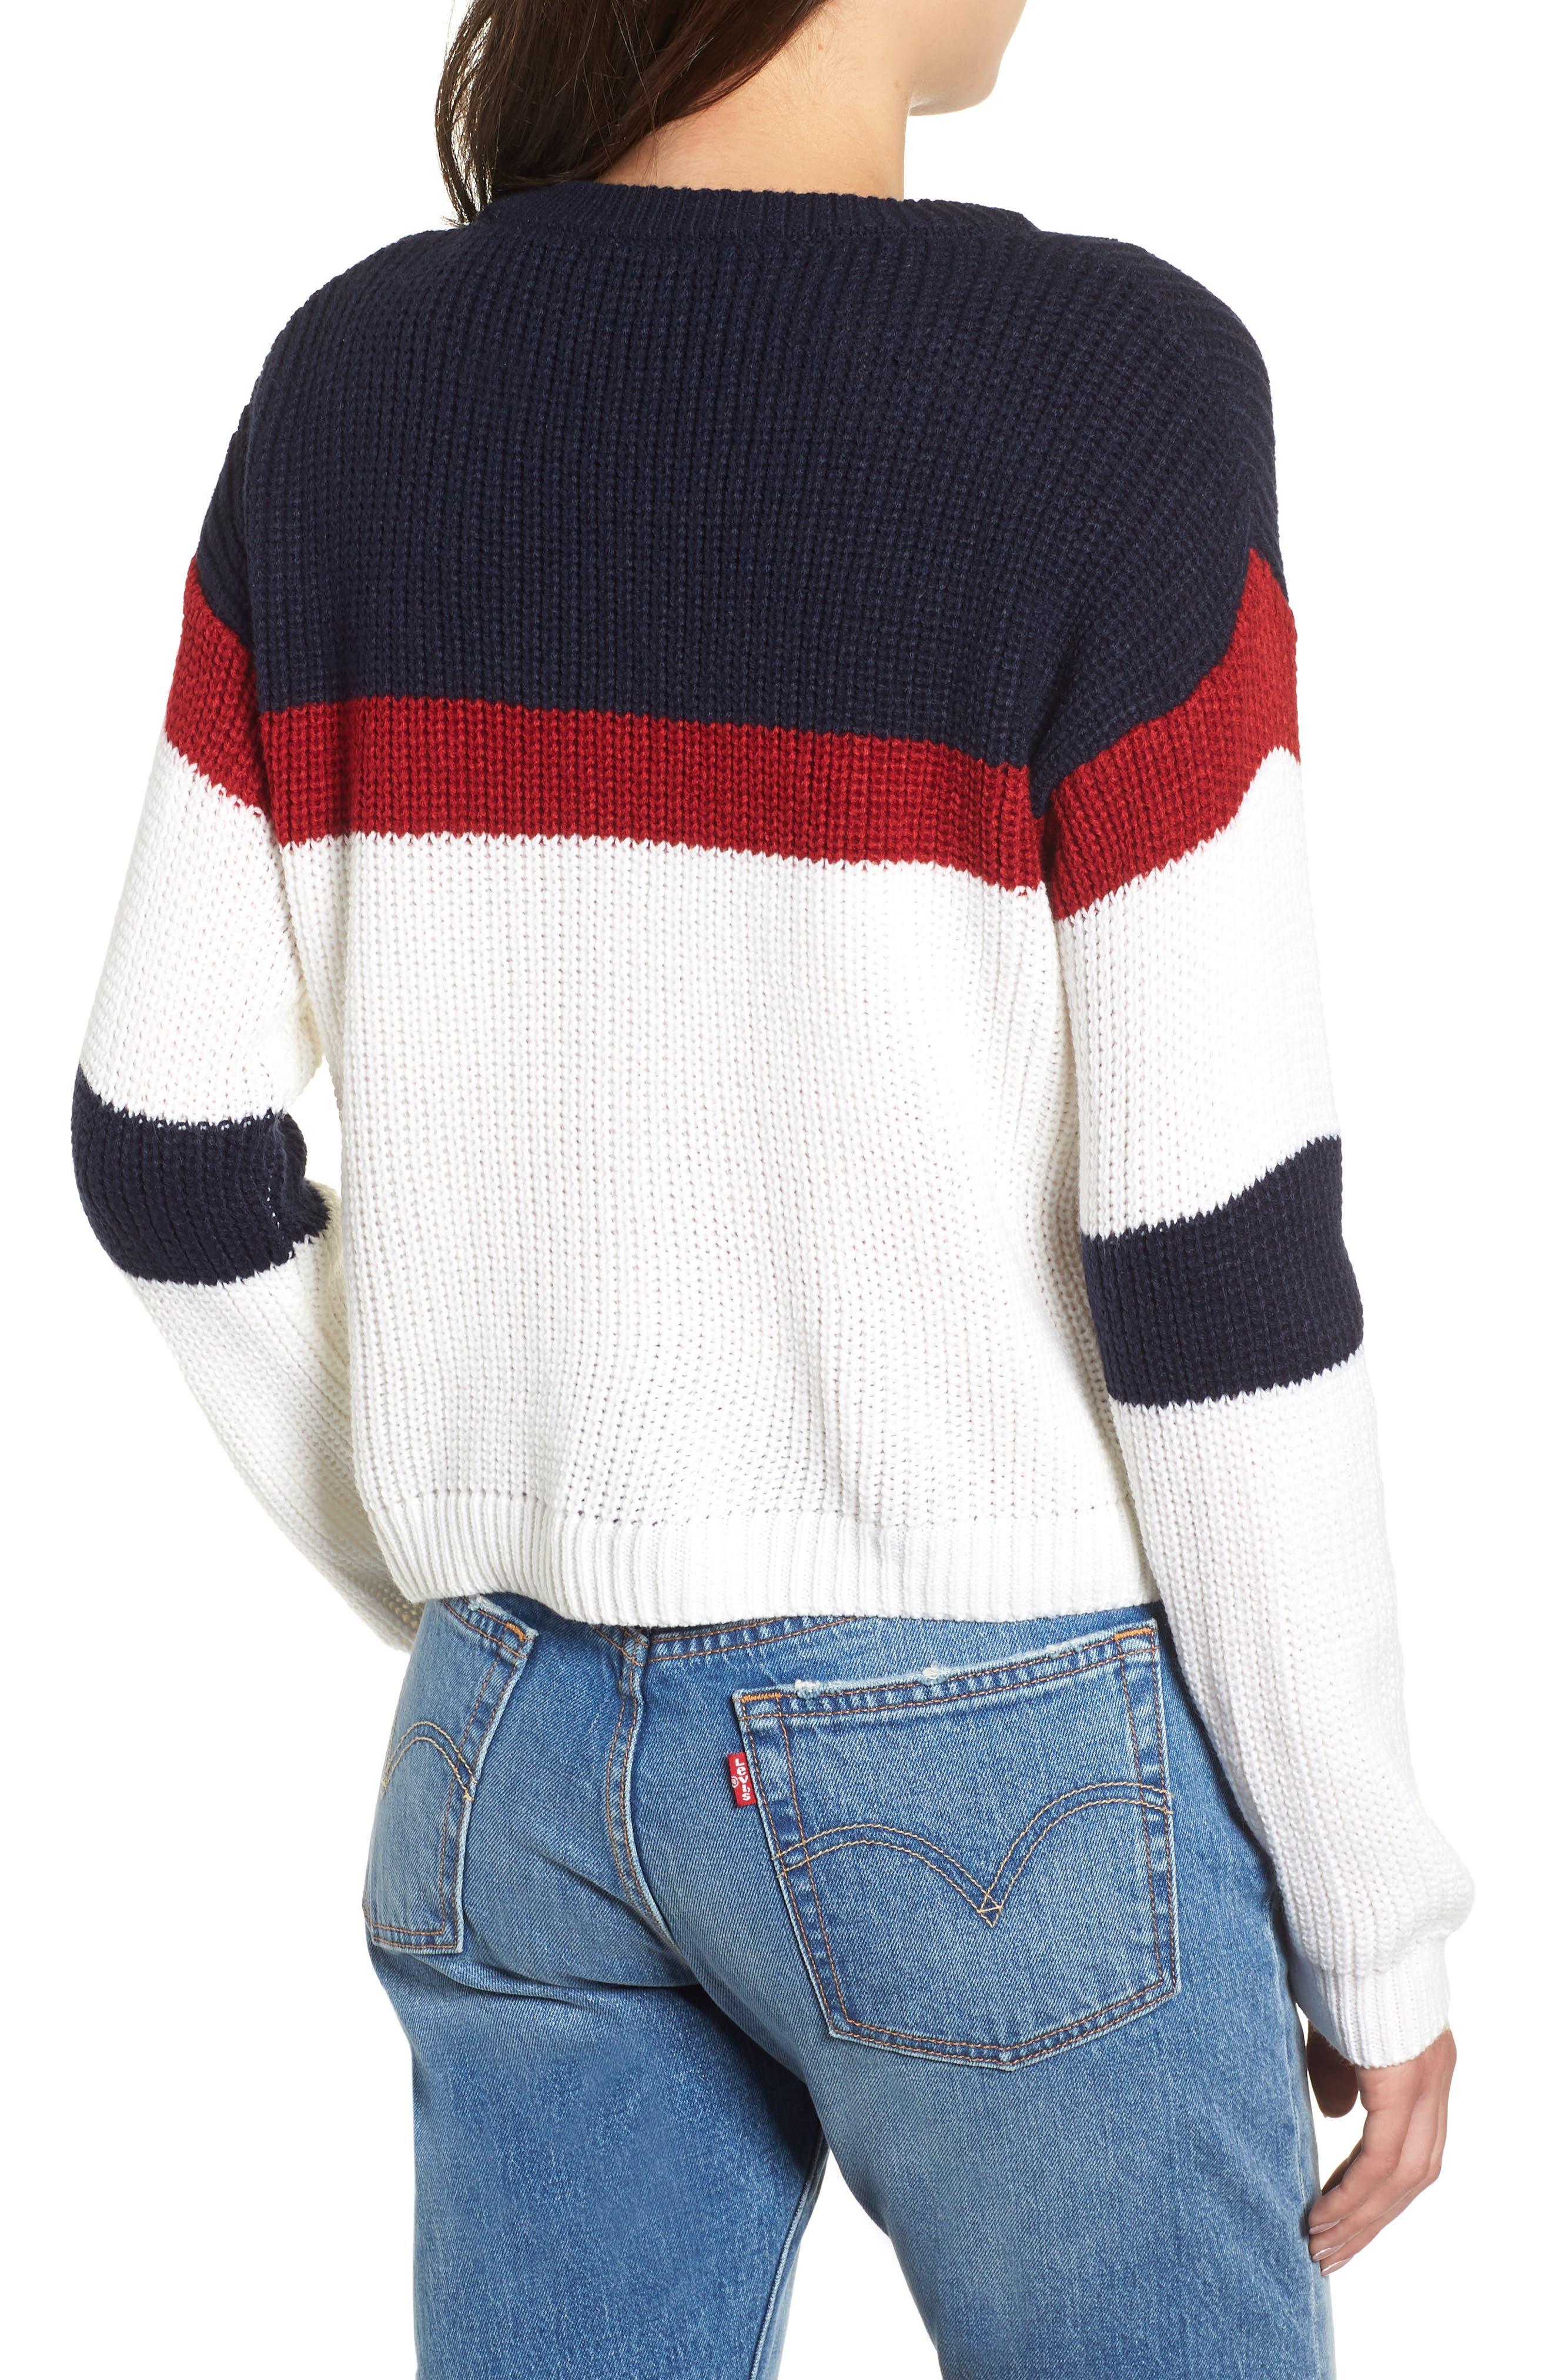 Allie Colorblock Crewneck Sweater,                             Alternate thumbnail 2, color,                             NAVY MULTI